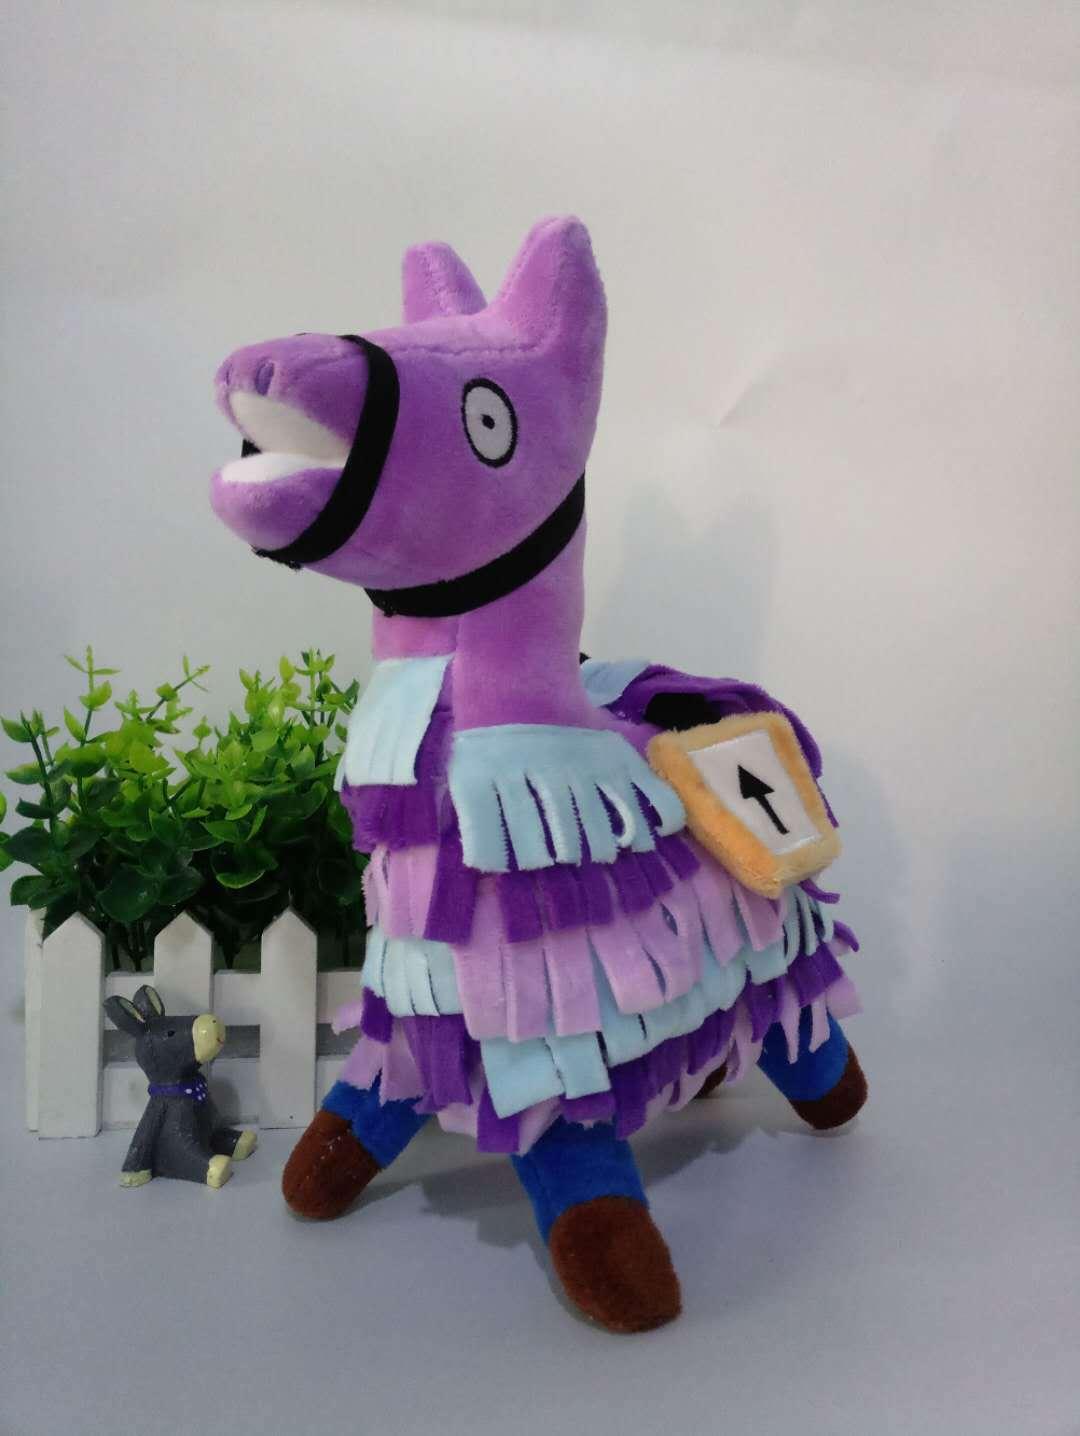 Hot Selling Mobilefortress Night fortnite Plush Doll Game Related Grass Mud Horse Alpaca rong wan ju Doll